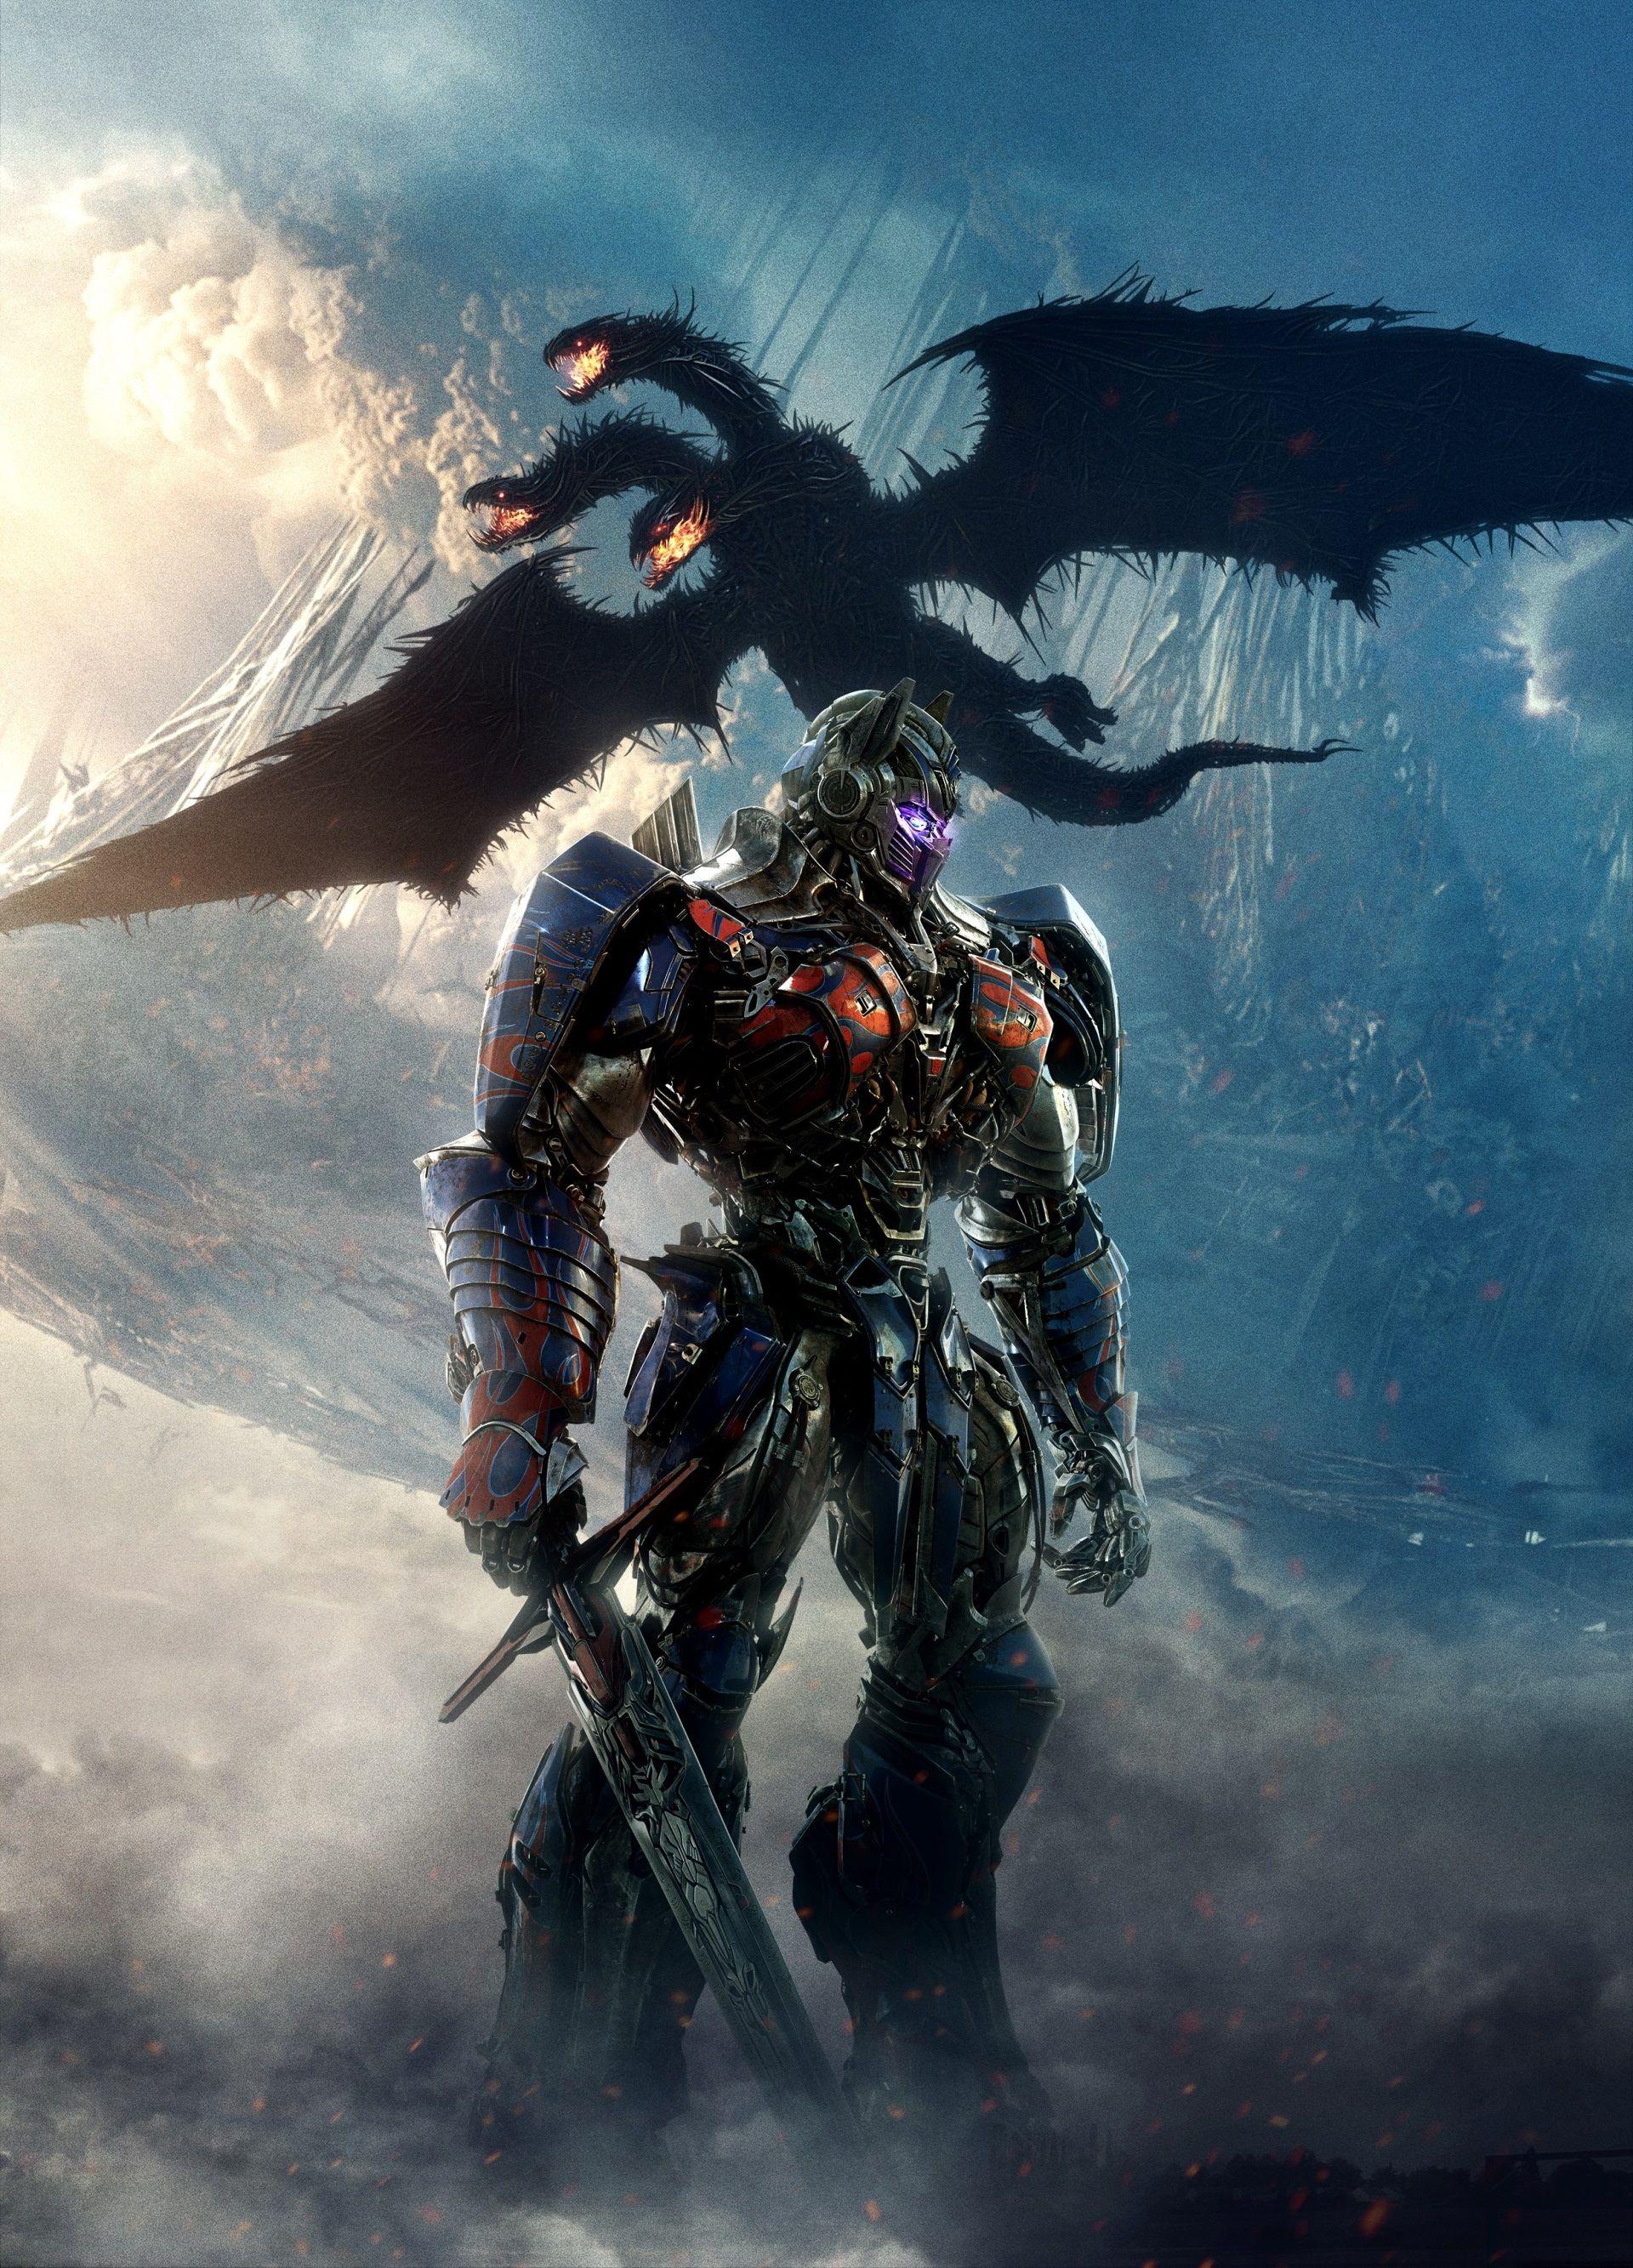 1920x2667 Transformers The Last Knight Wallpaper Hd Pc Download